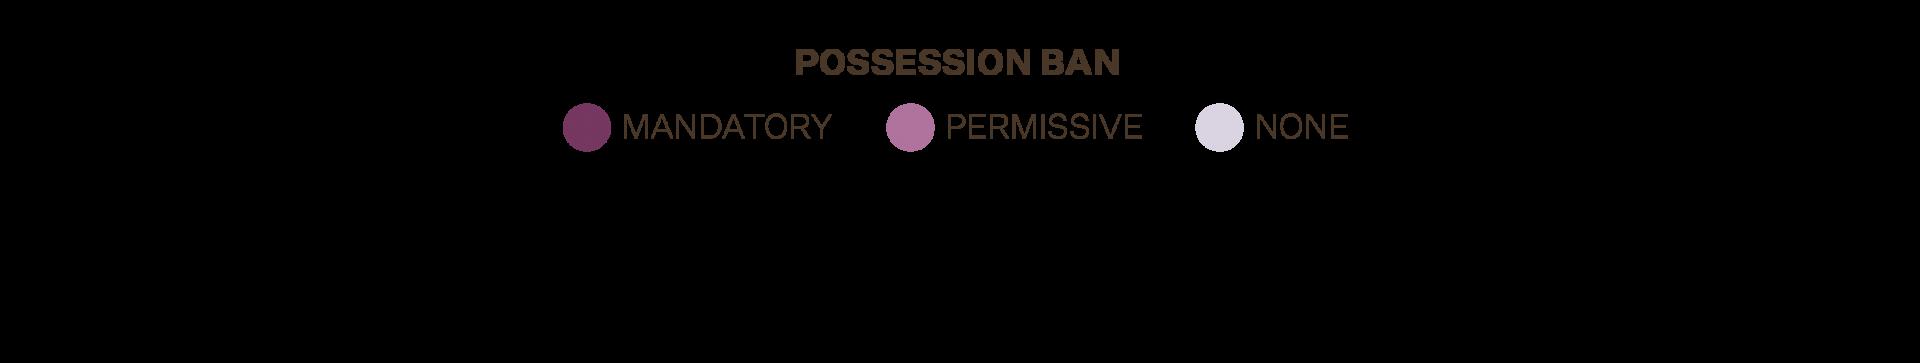 2019 Trend Report: Post-Conviction Possession Bans